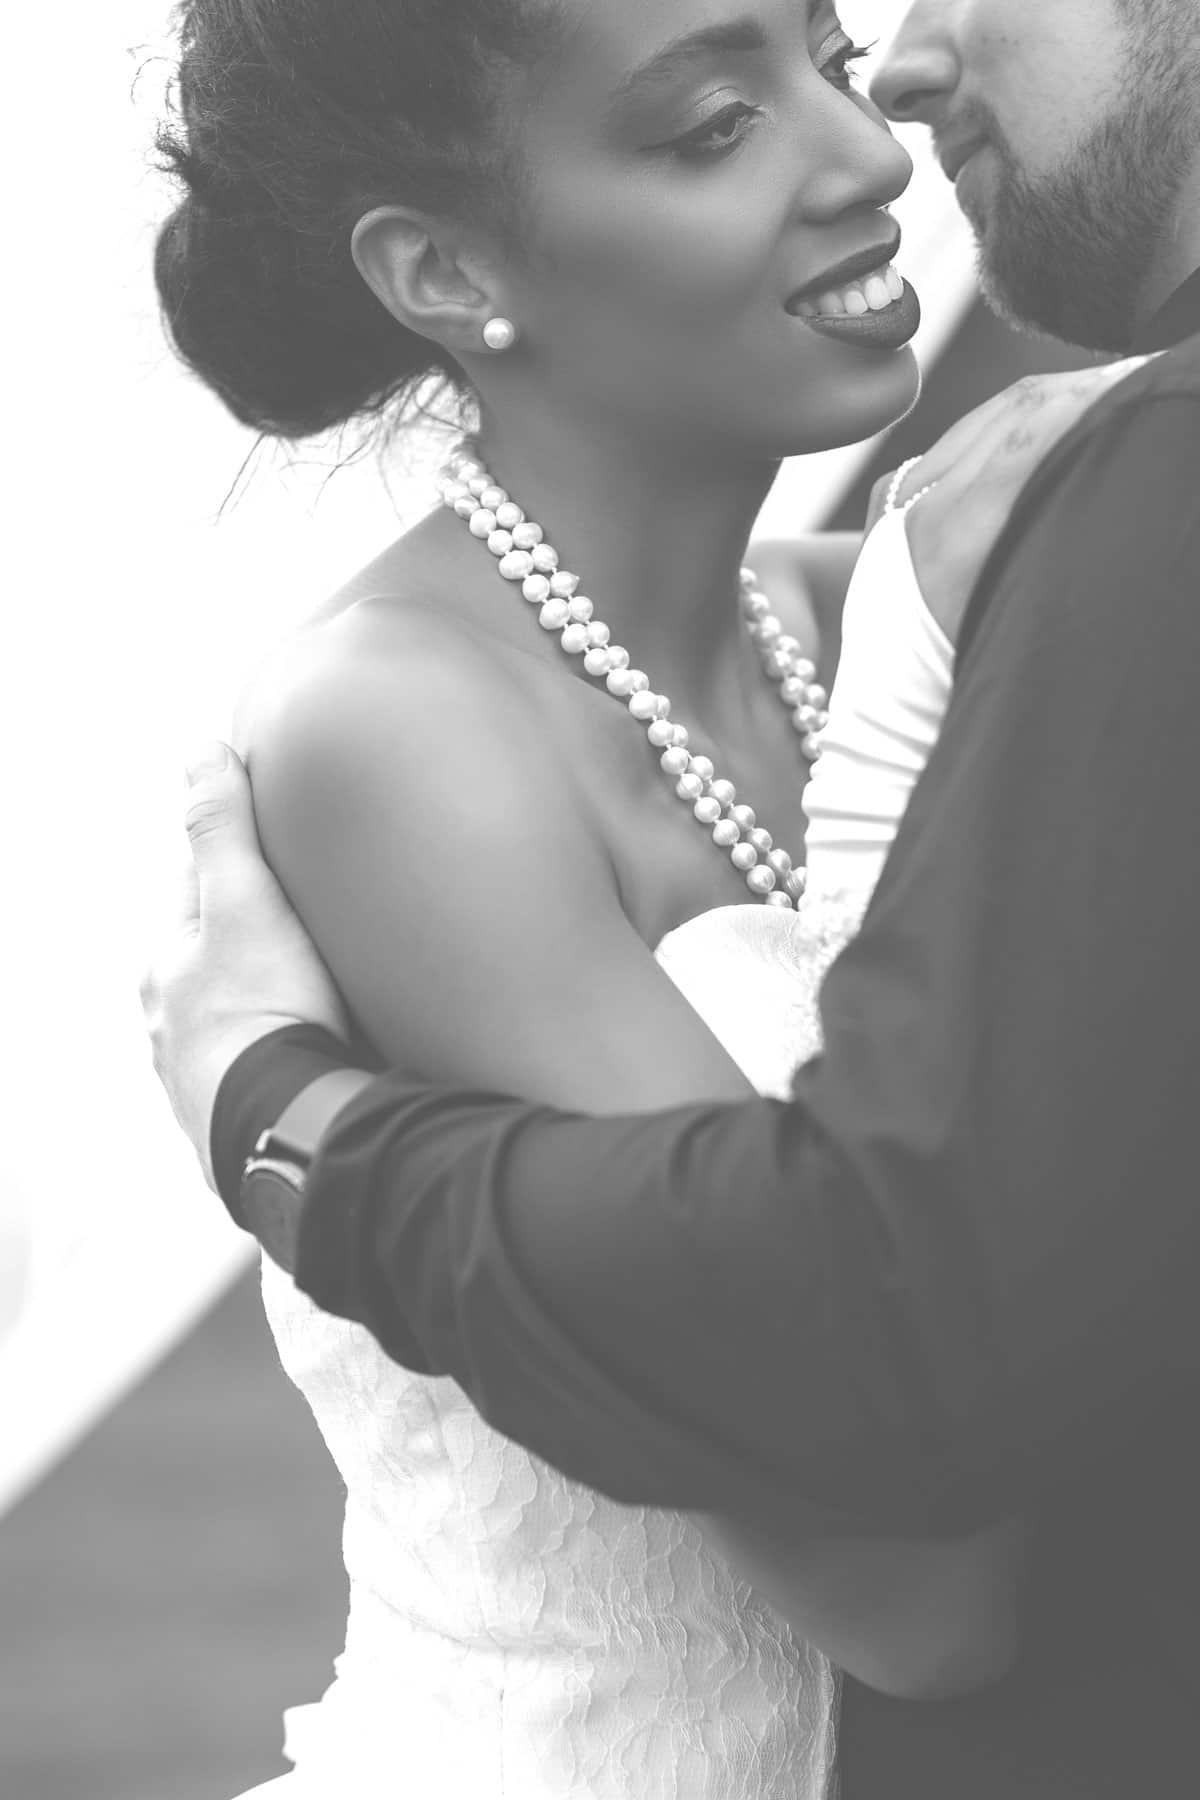 Wedding photography in Birmingham uk, outdoor wedding photoshoot Staffordshire, bride and groom, professional wedding photographer Staffordshire